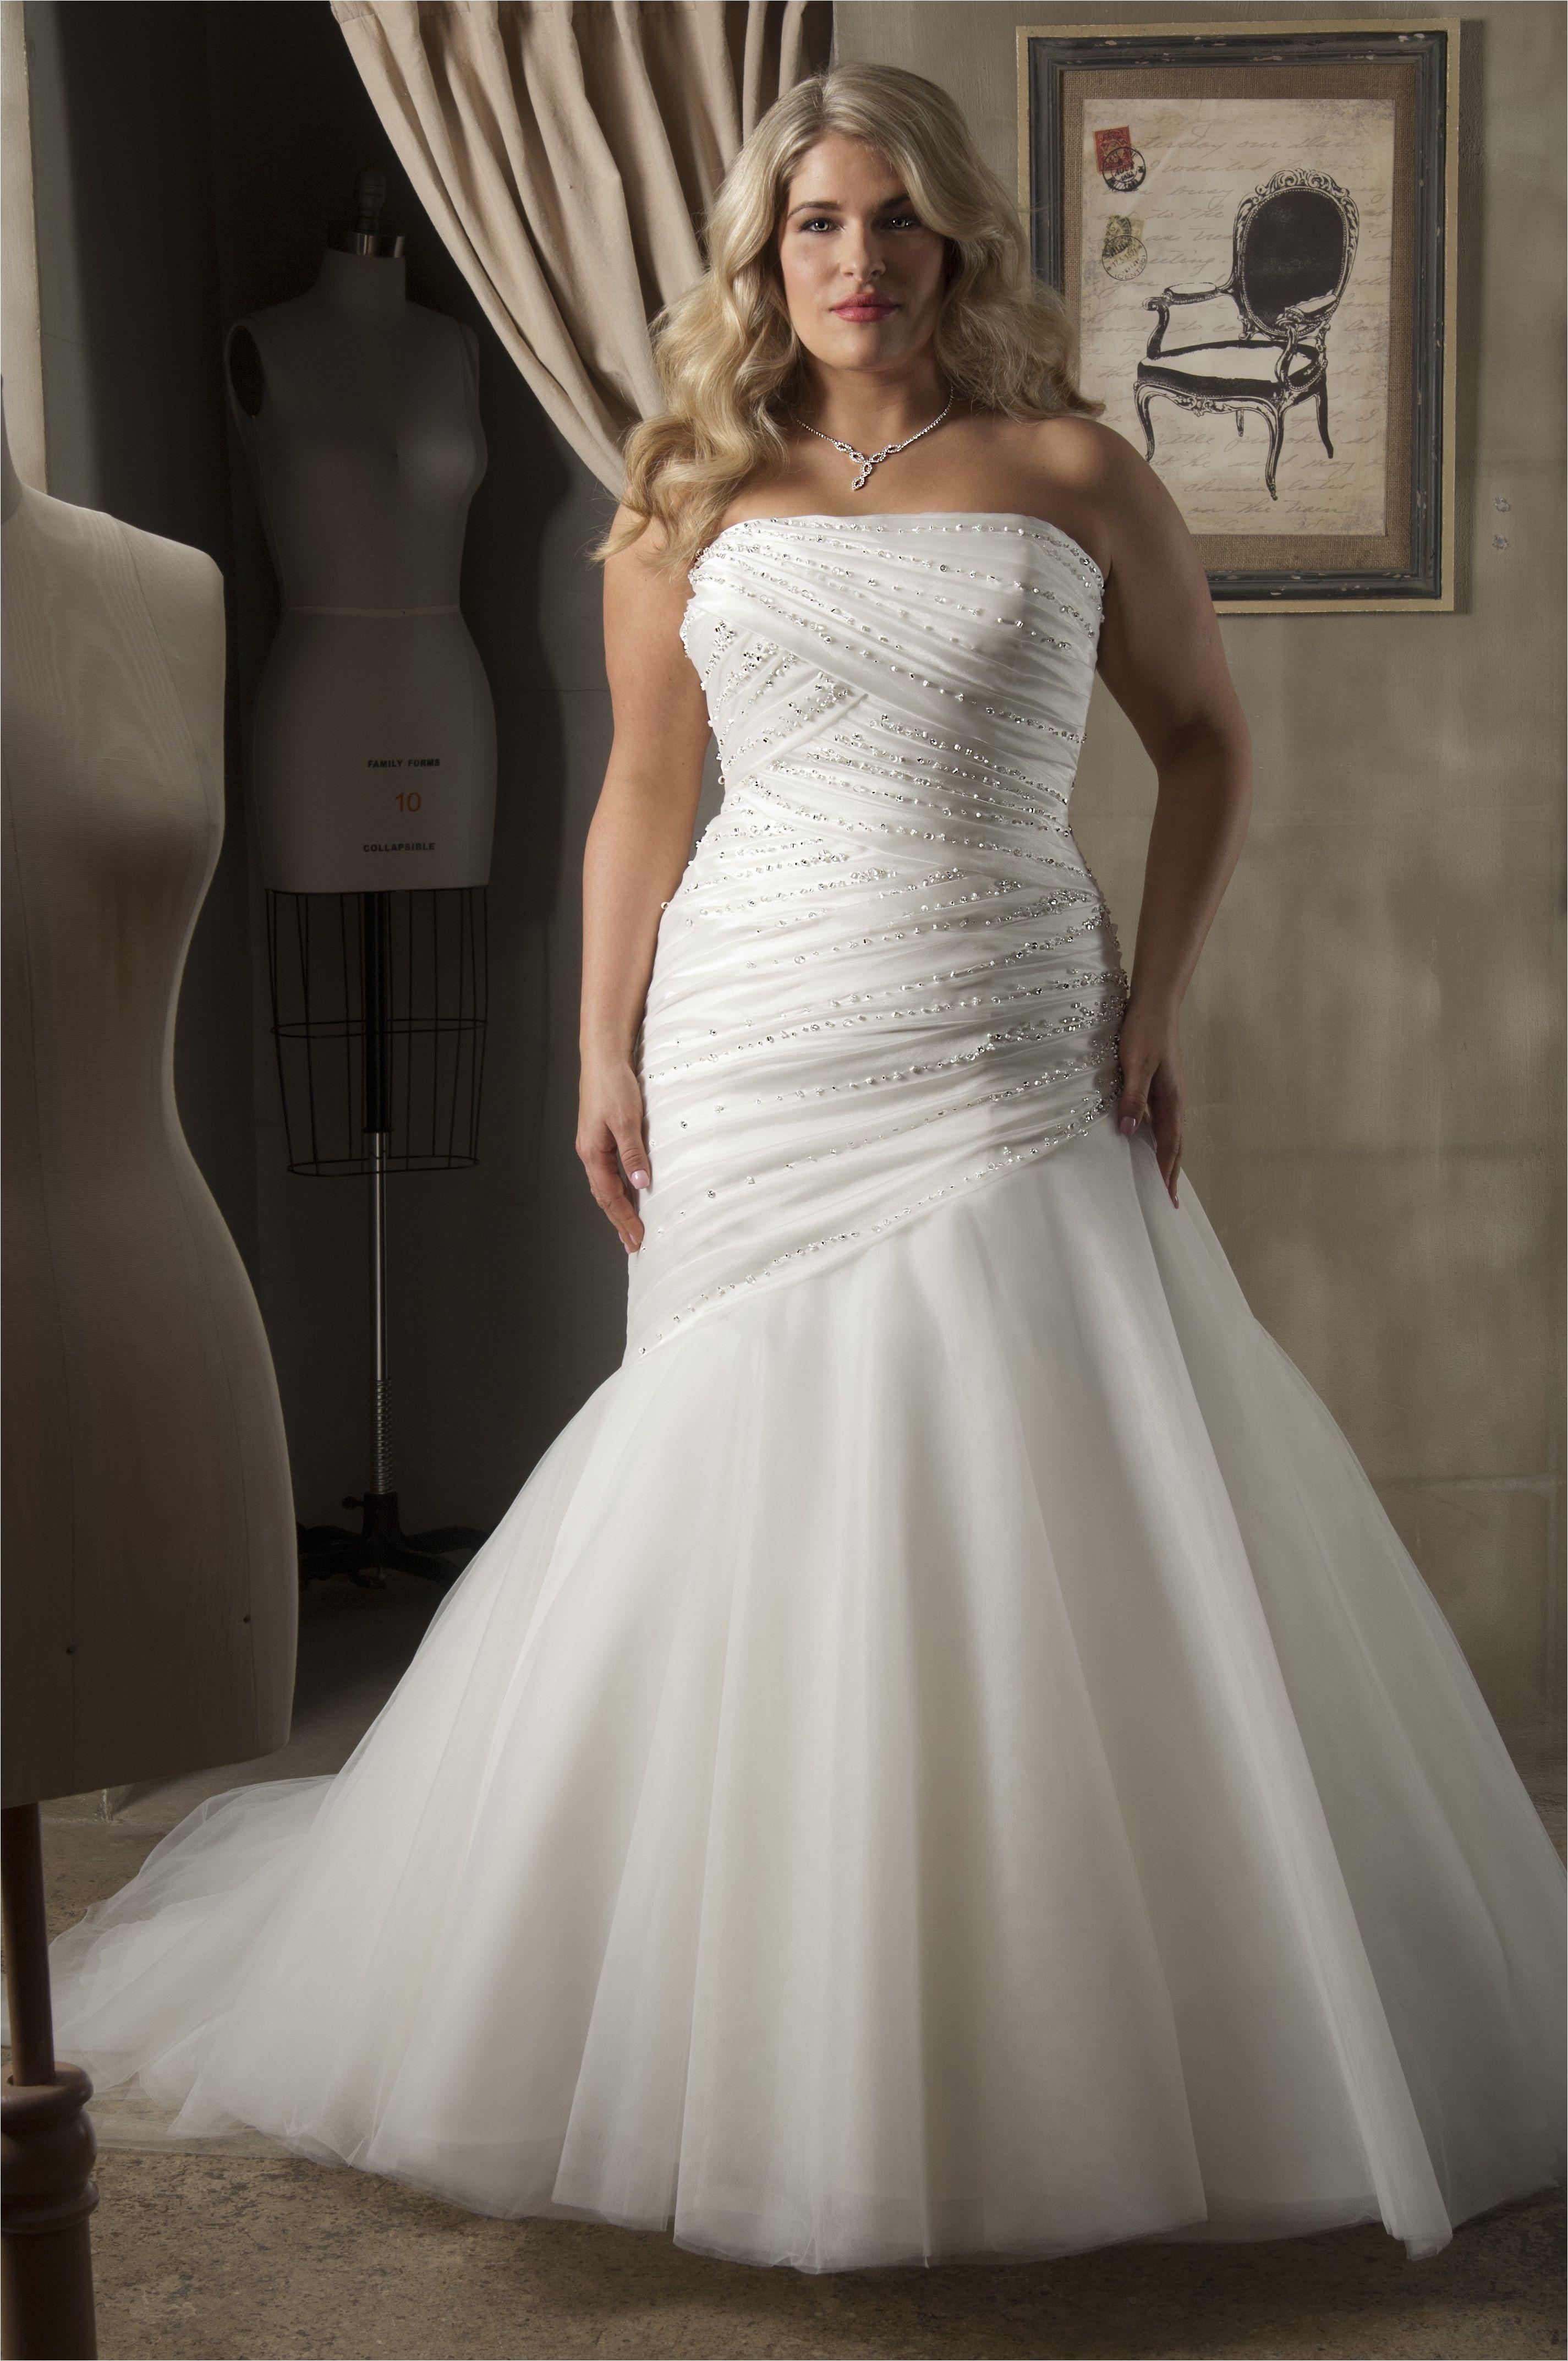 80 Plus Size Mermaid Wedding Dresses Inspiration For Your Gorgeous Wedding Flapper Wedding Dresses Trendy Wedding Dresses Wedding Dress Inspiration [ 4290 x 2850 Pixel ]